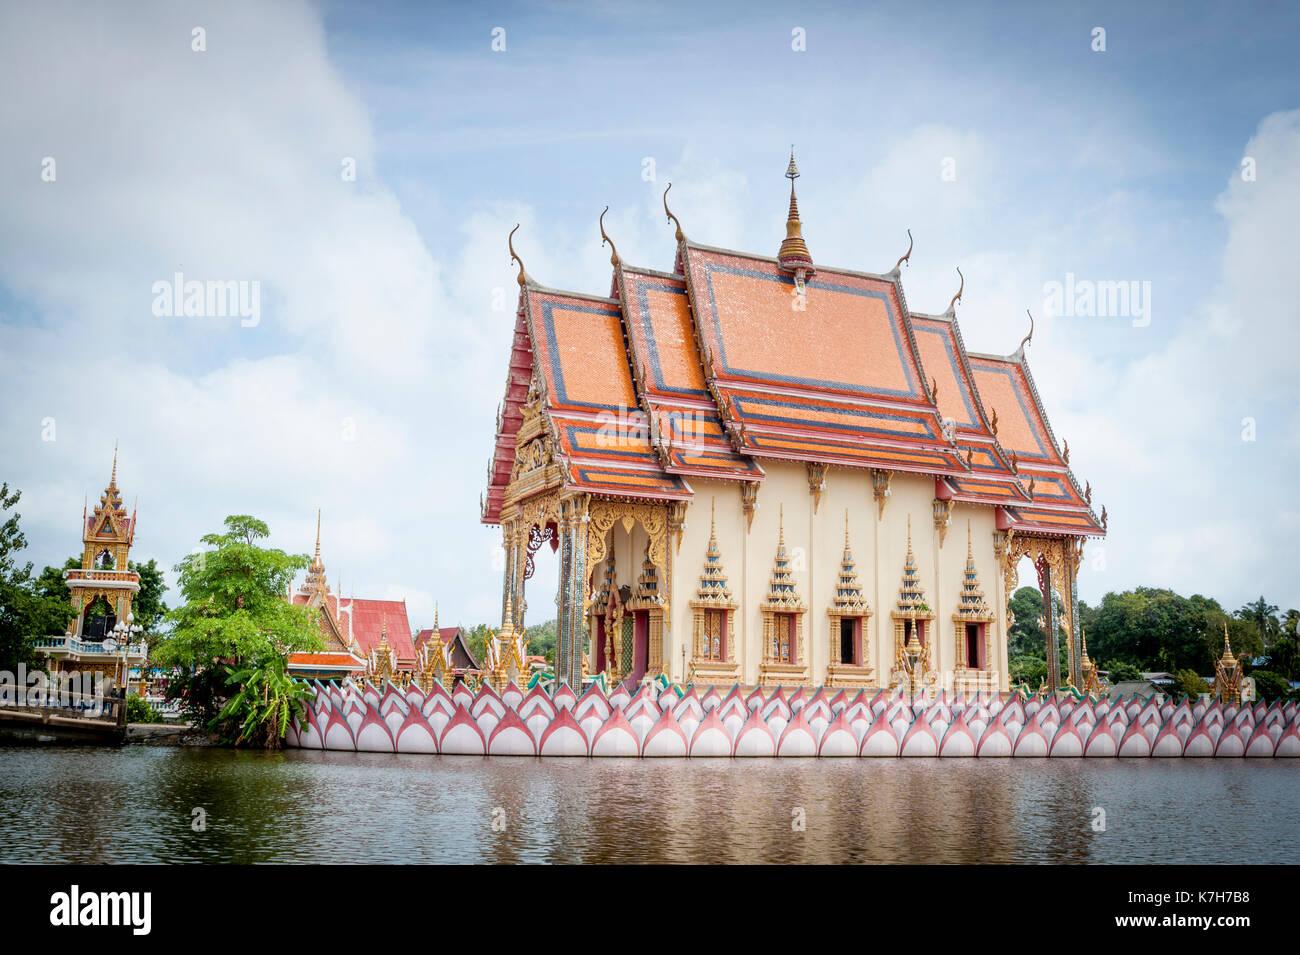 Wat Plai Leam, a Buddhist temple on the island of Ko Samui, Thailand. - Stock Image